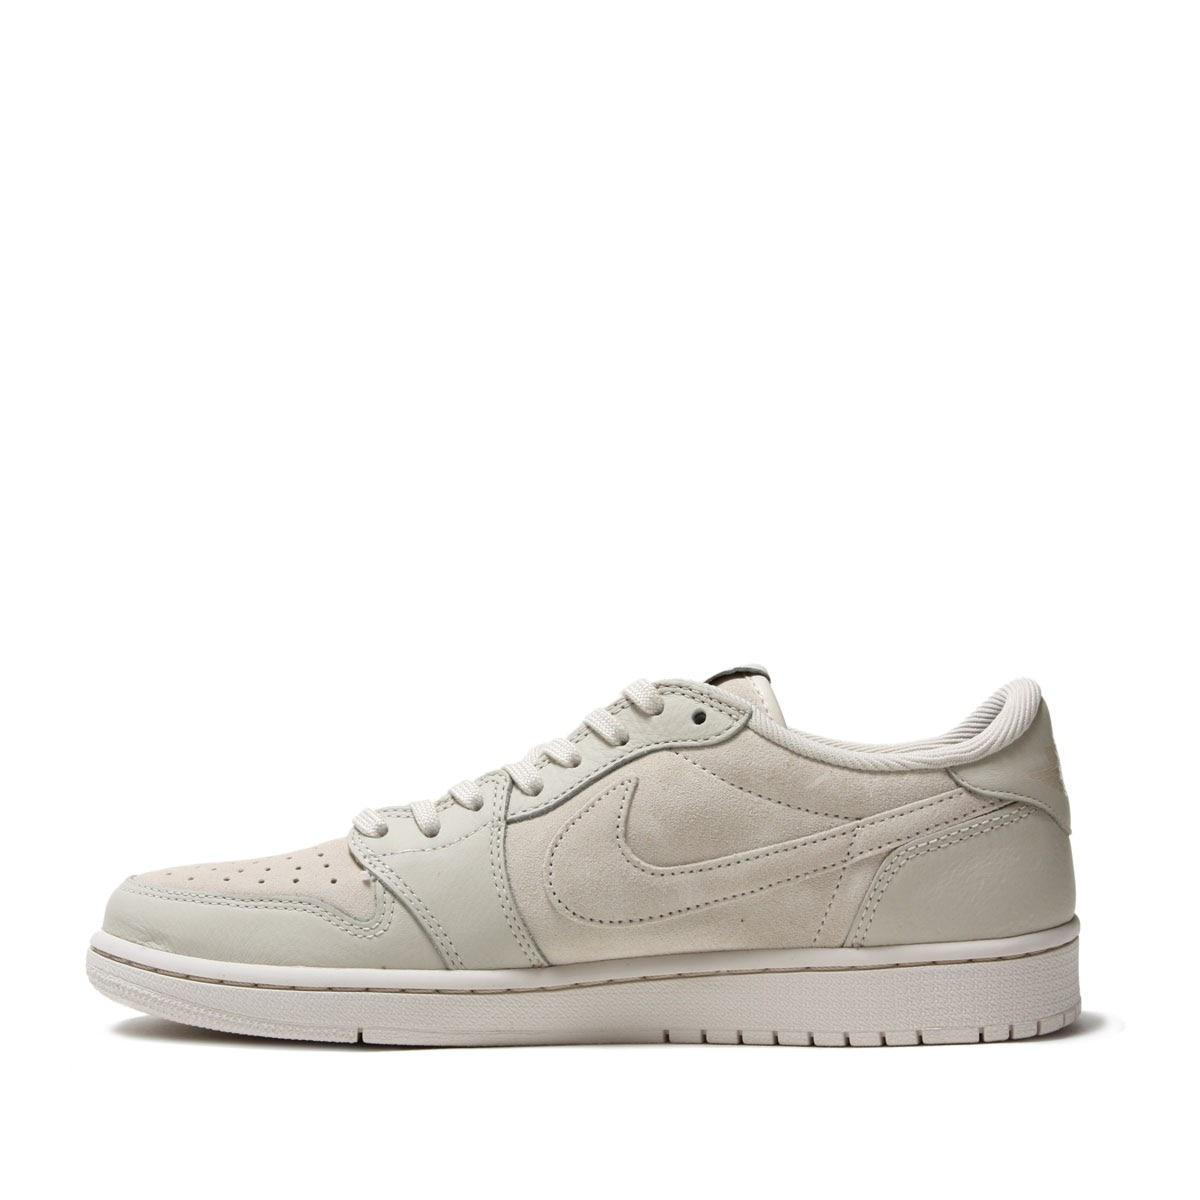 NIKE AIR JORDAN 1 LOW PREM (Nike Air Jordan 1 low premium) LT OREWOOD  BRN/LT OREWOOD BRN 17FA-I